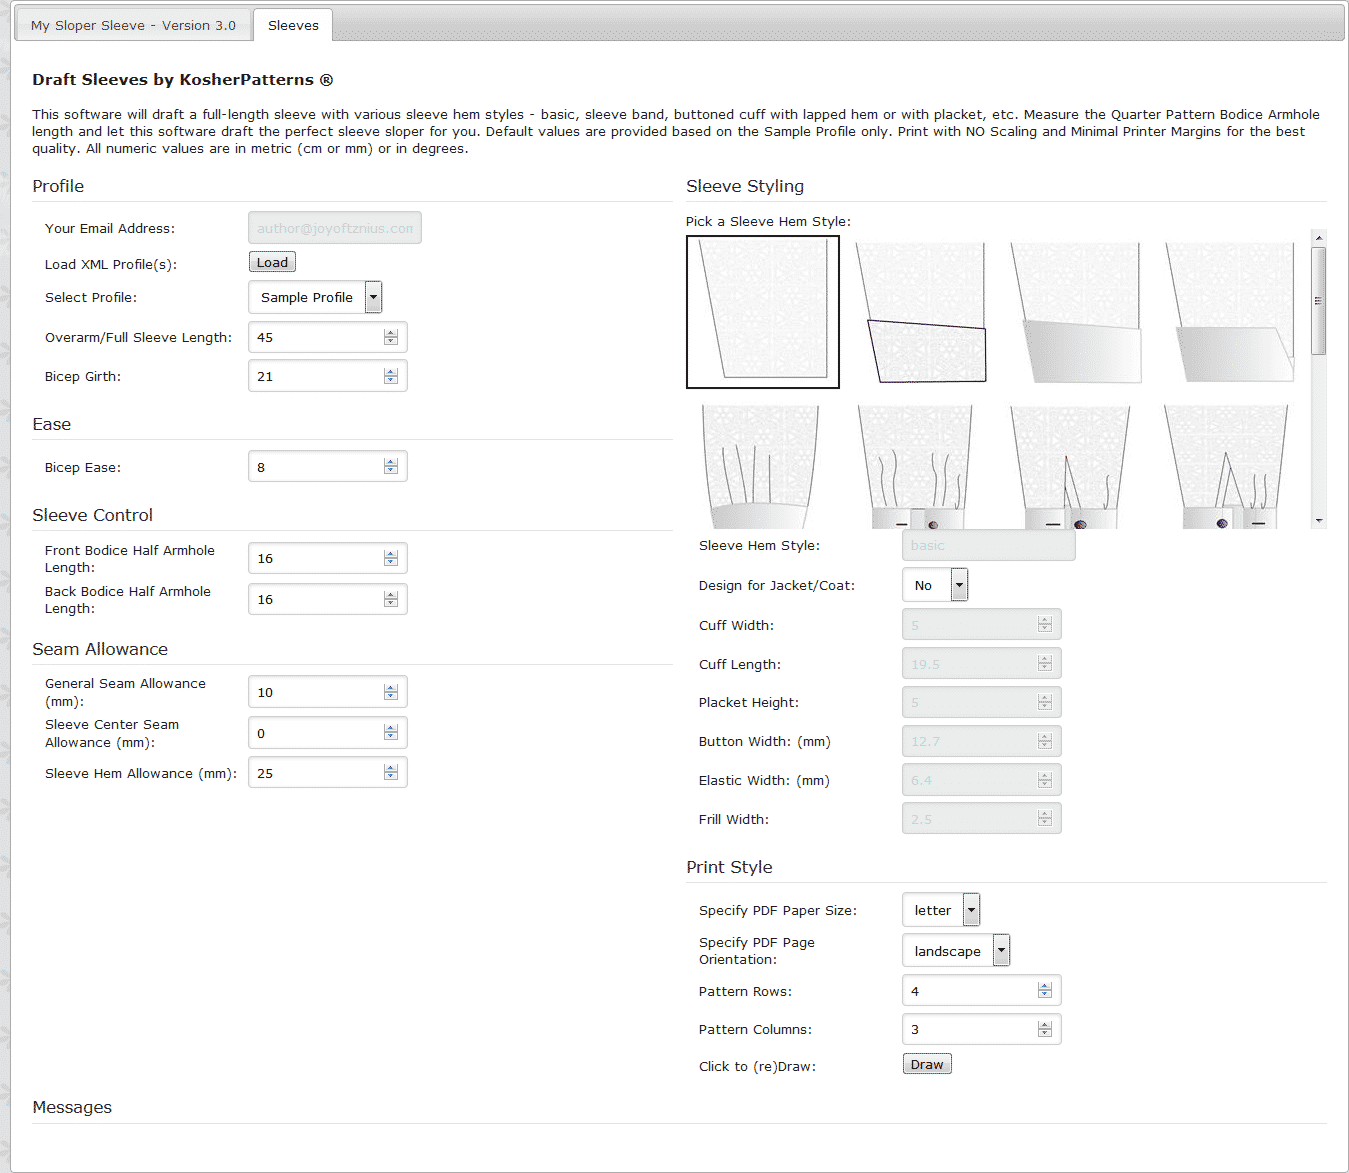 My Sloper Sleeve 3.0